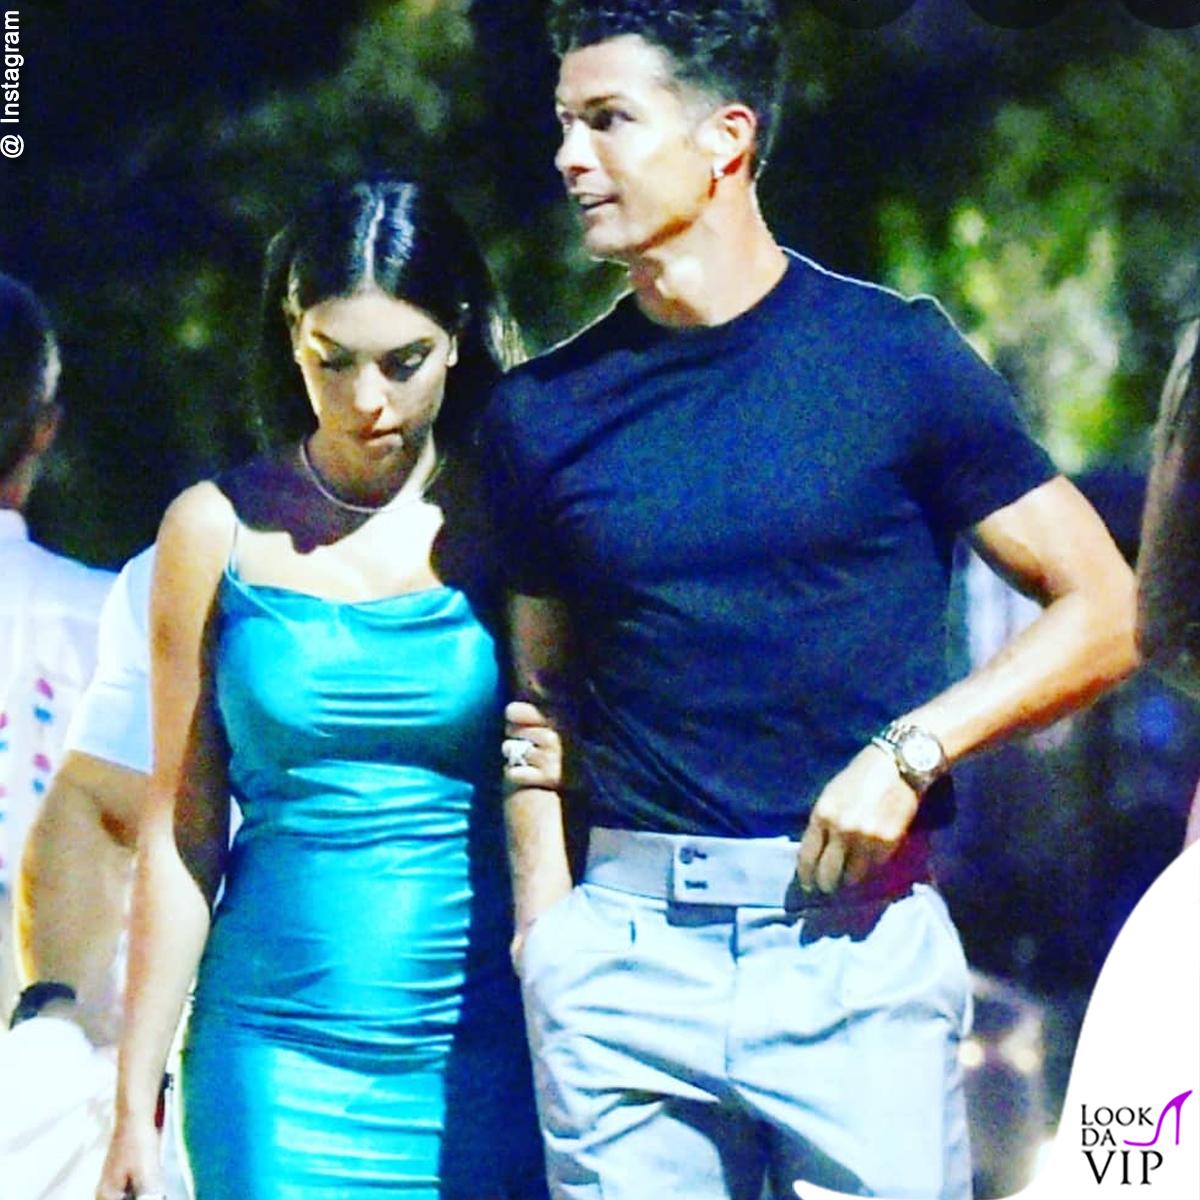 Georgina-Rodriguez-e-Cristiano-Ronaldo-outfit-Fenty-e-Alessandro-Martorana